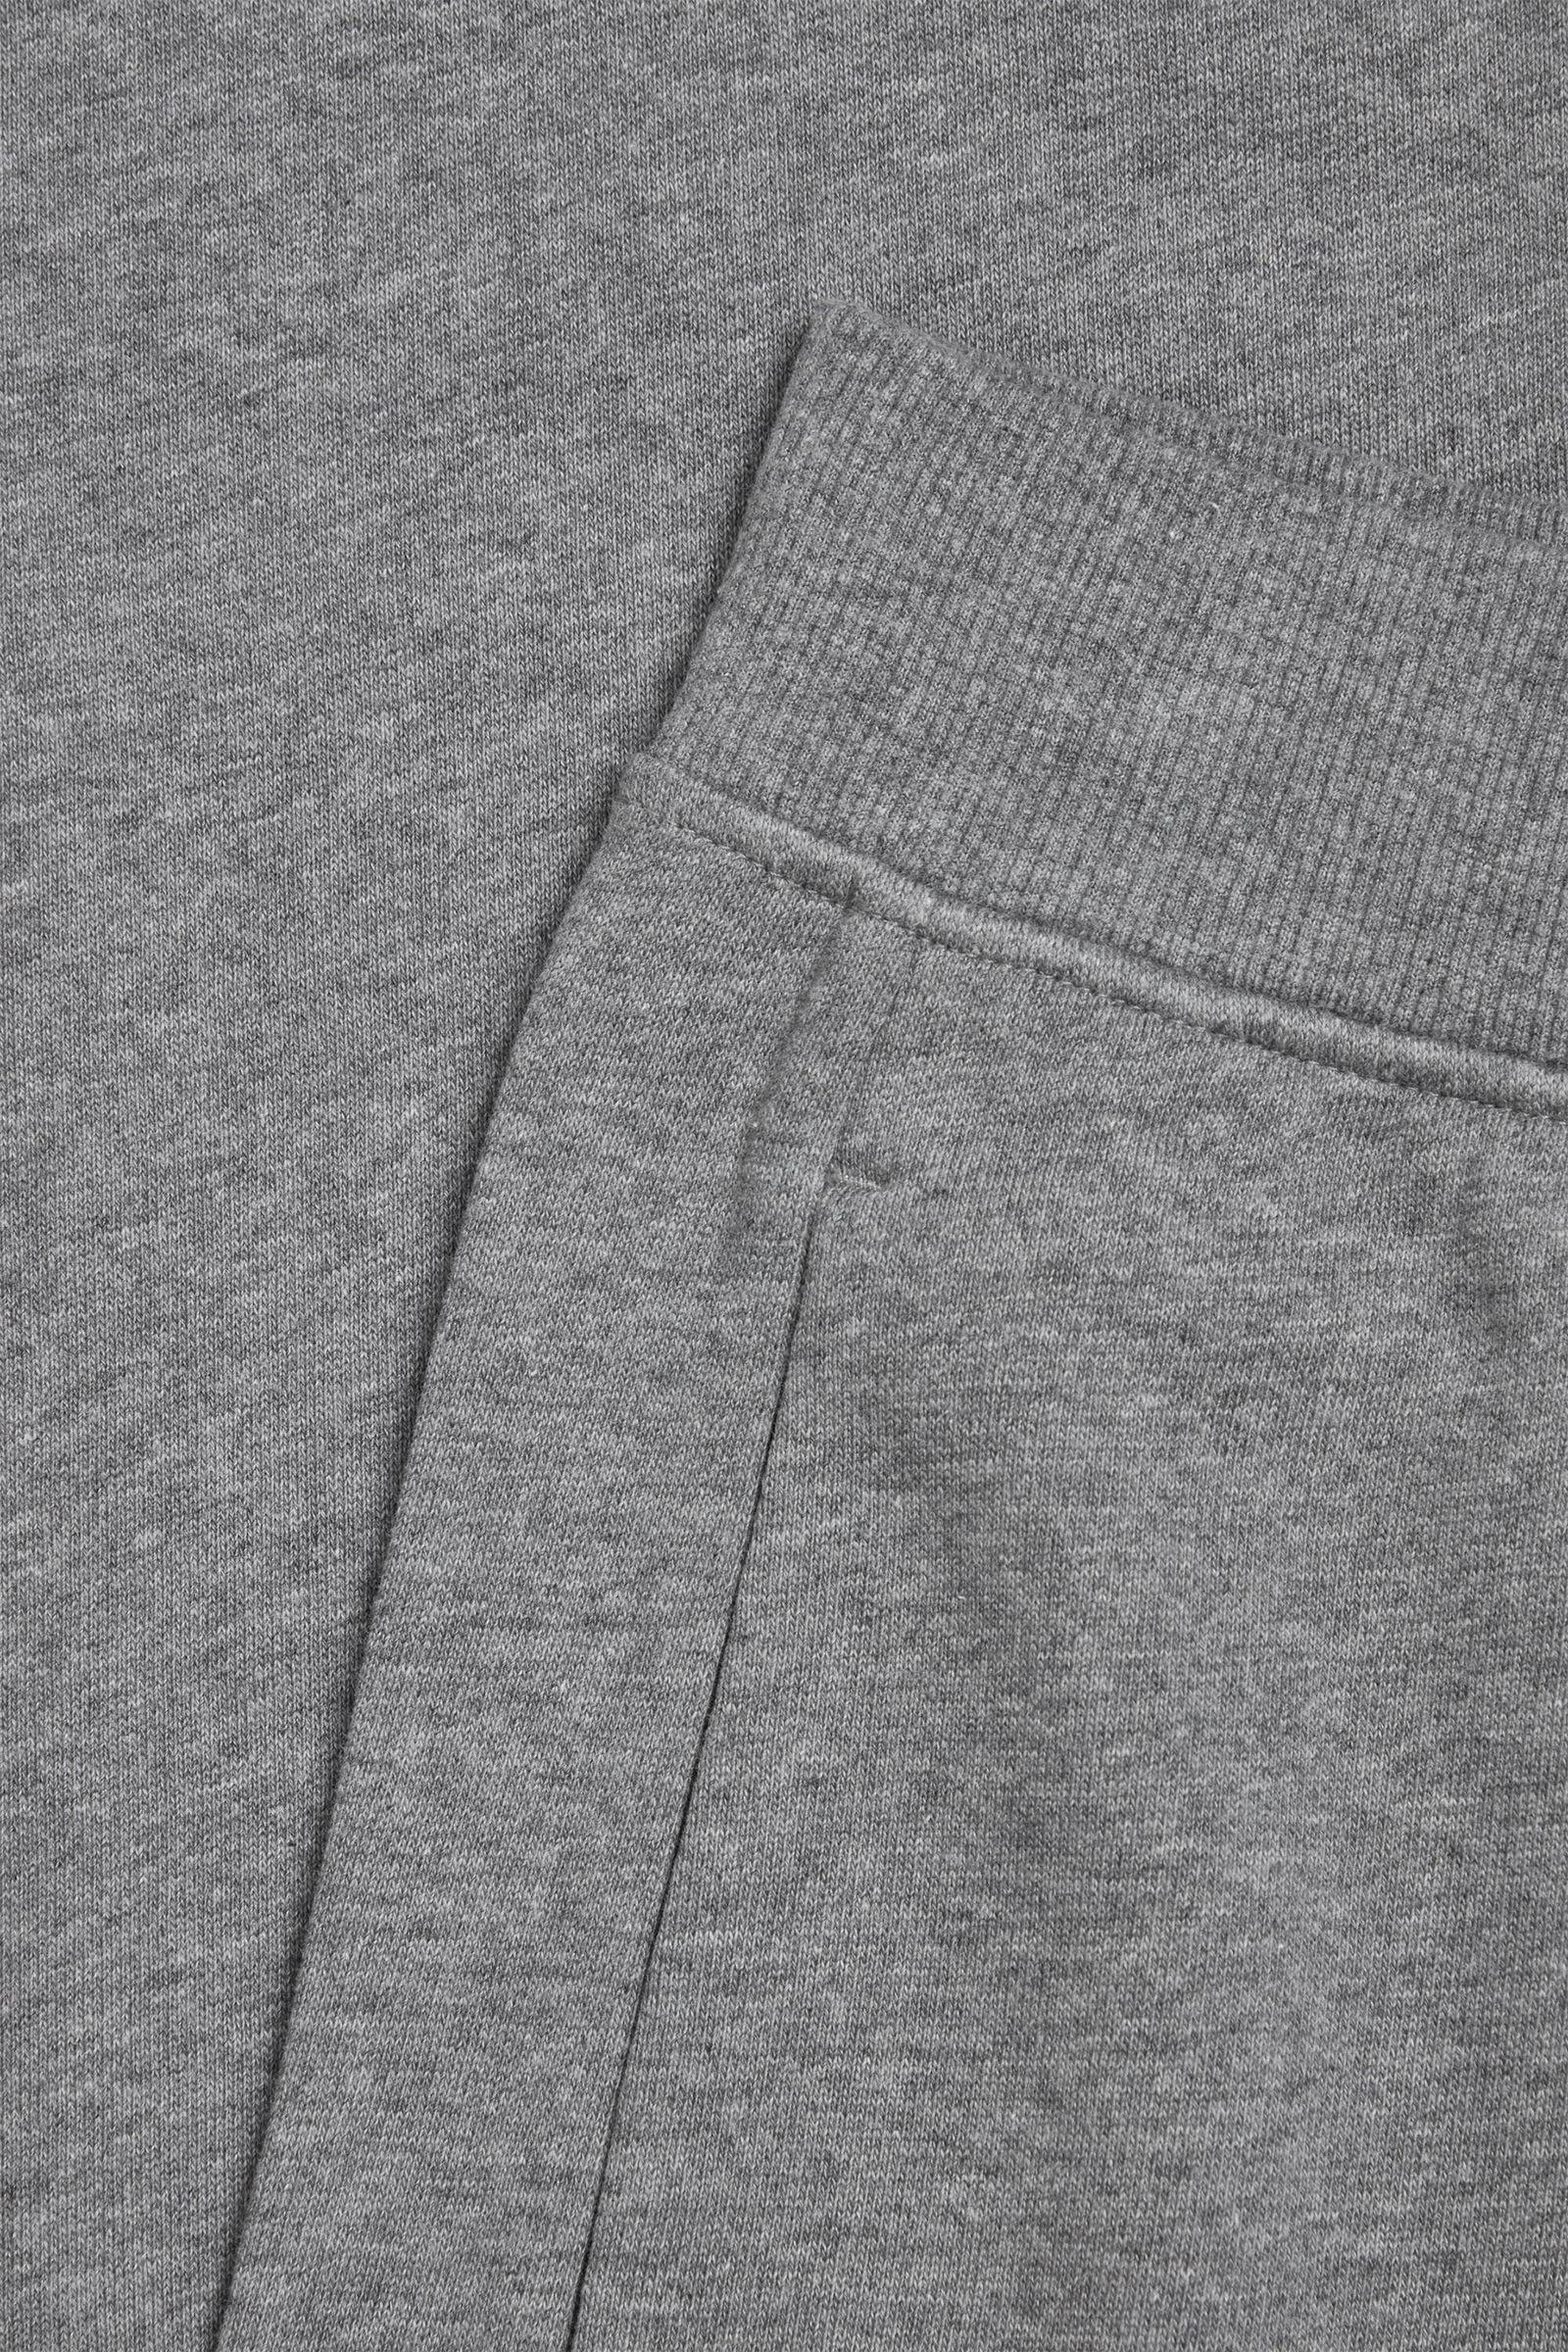 COS 오가닉 코튼 저지 조거의 그레이컬러 Detail입니다.